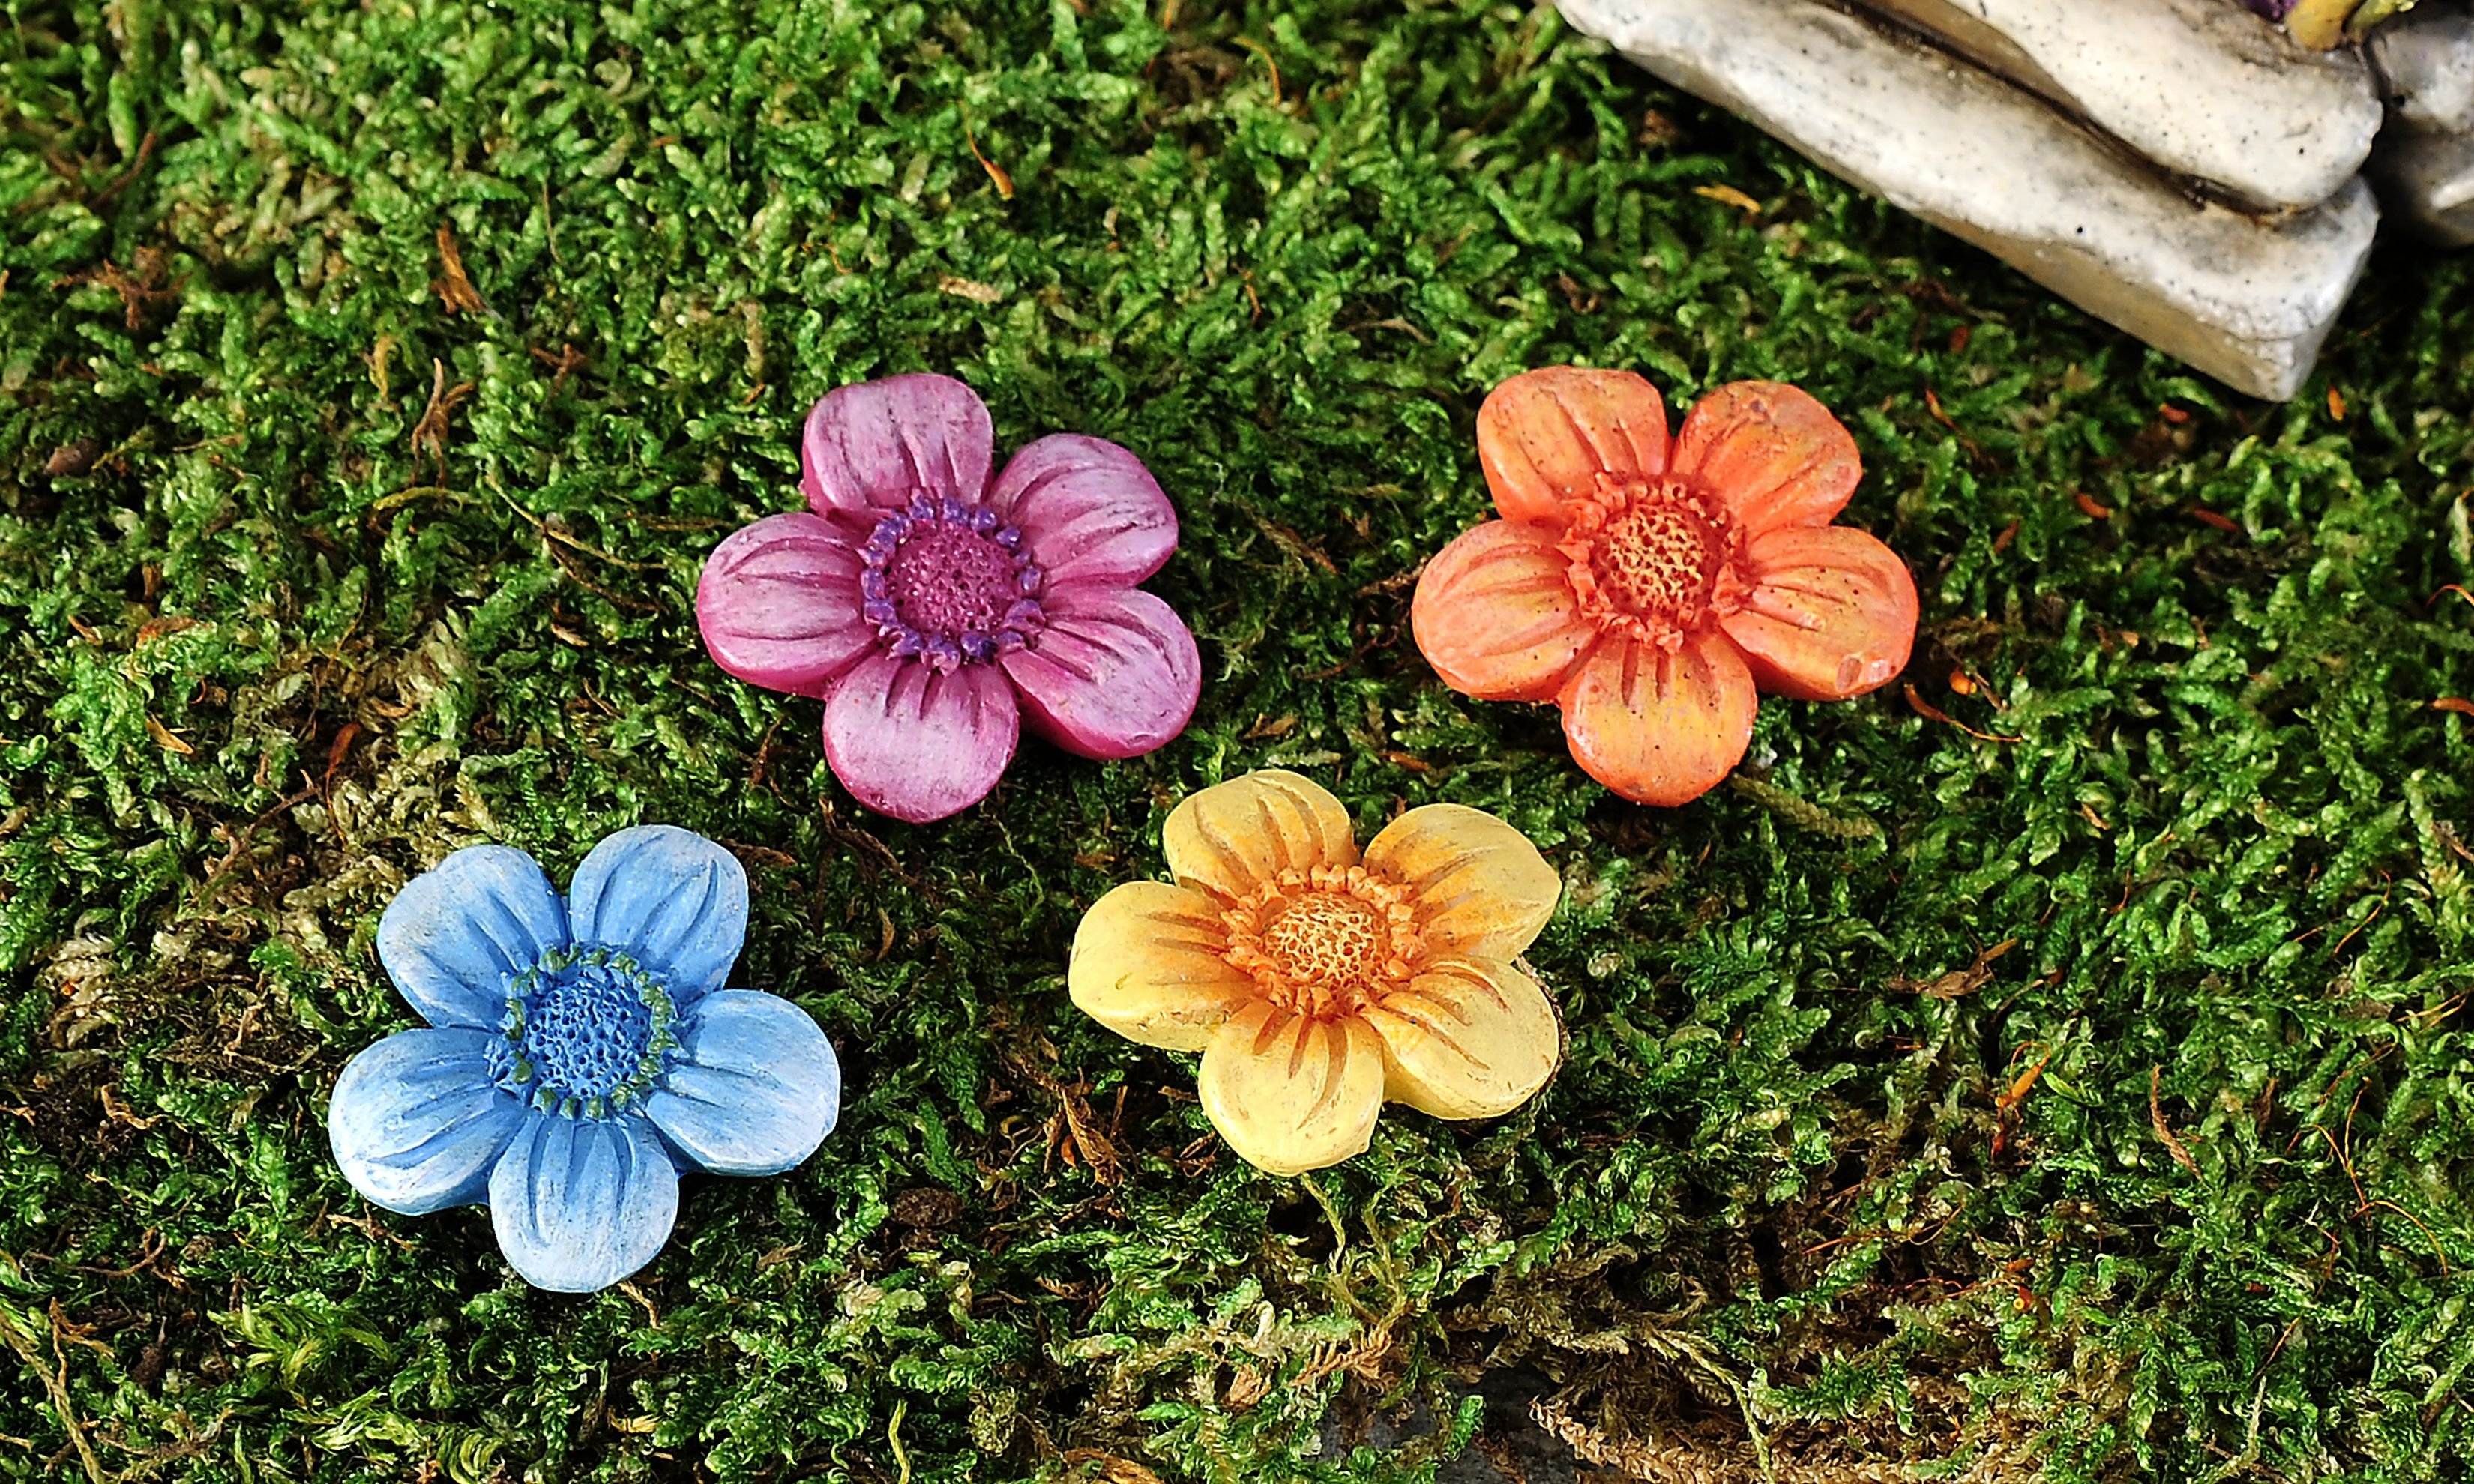 Giftcraft - Mini World Garden Fairytale Flower Stepping Stone, 4/Asst.